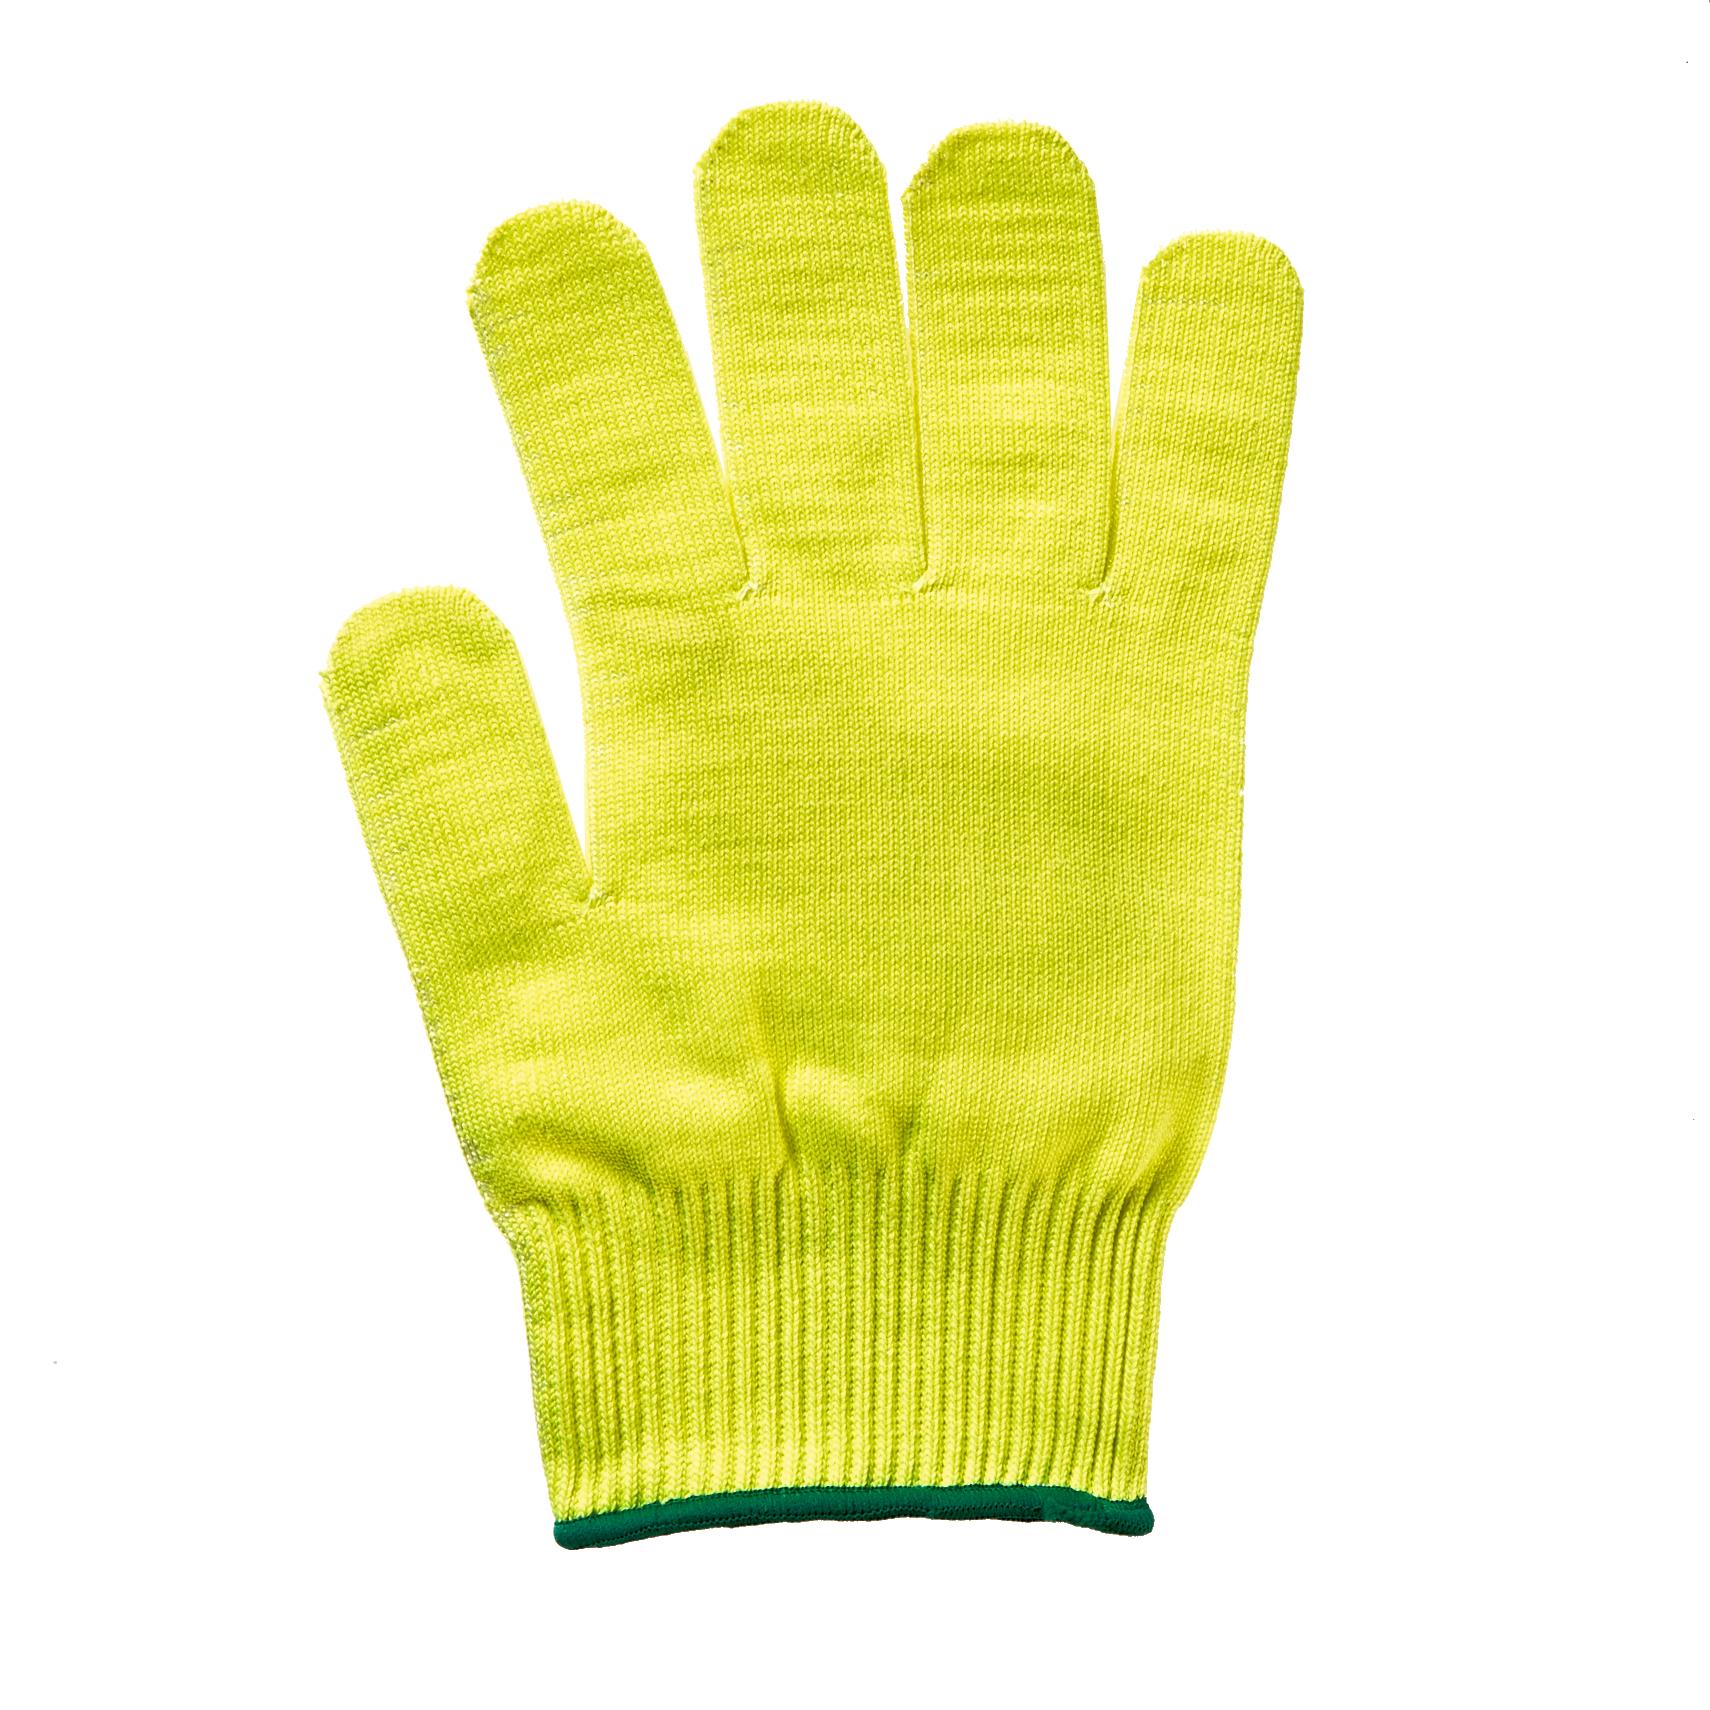 Mercer Culinary M33415YLM glove, cut resistant